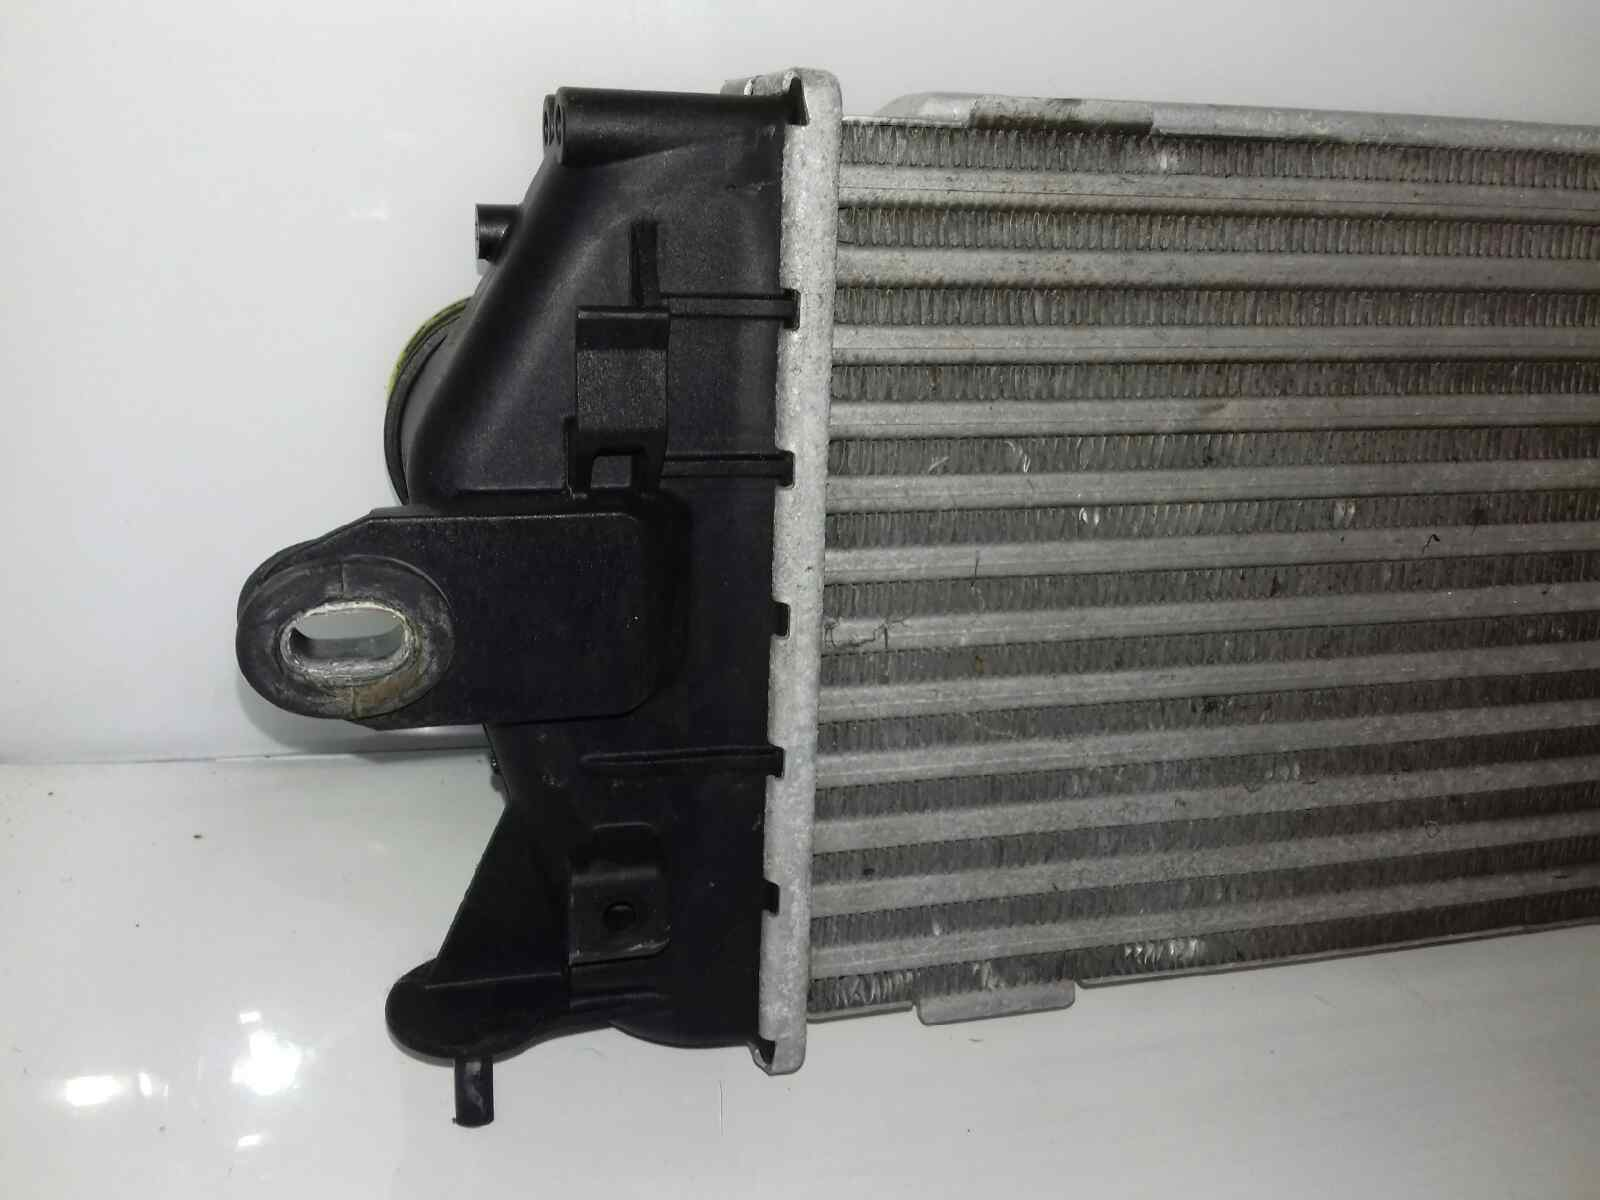 Intercooler Renault Trafic Ii Box Fl 20 Dci 115 Fl01 Fl0u 370050 2 Fuse 8200411160c8200411160c